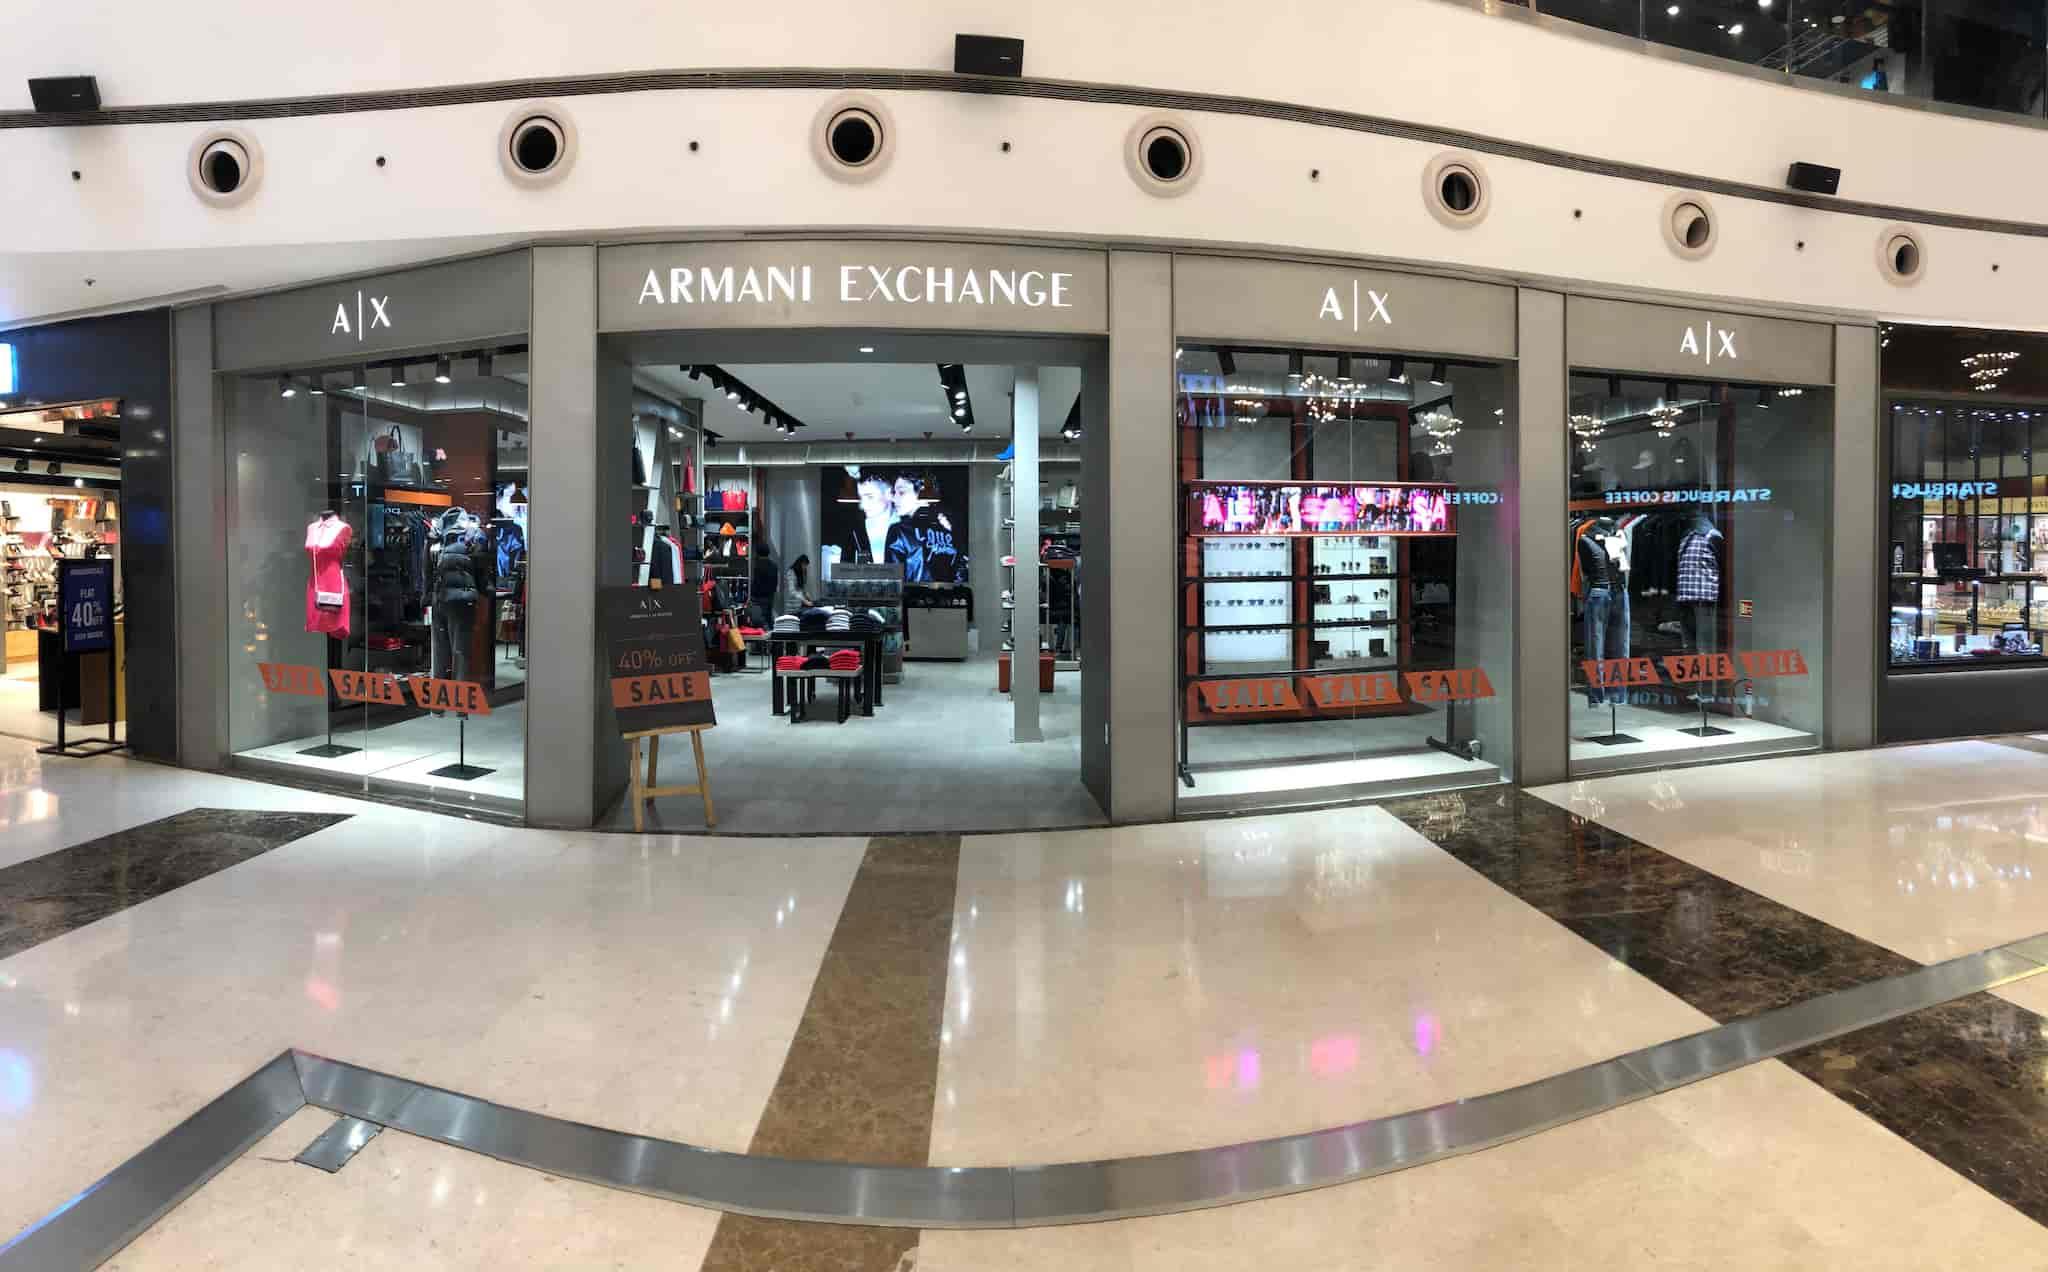 separation shoes 33398 b3c4d Armani Exchange, Noida - Jeans Retailers in Noida, Delhi ...